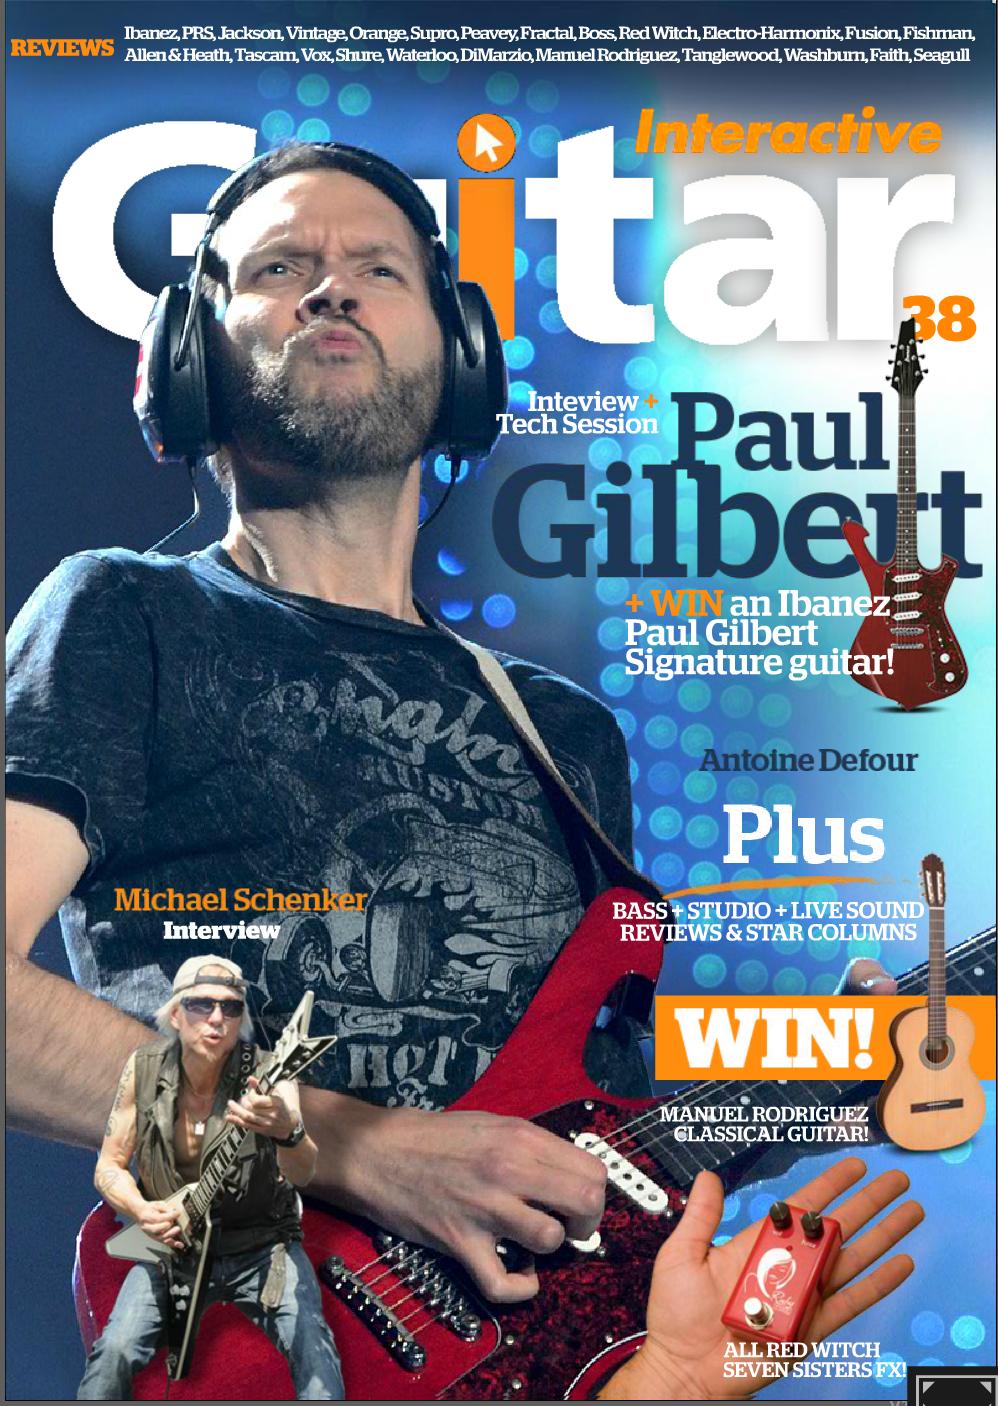 Guitar Interactive - Ivy